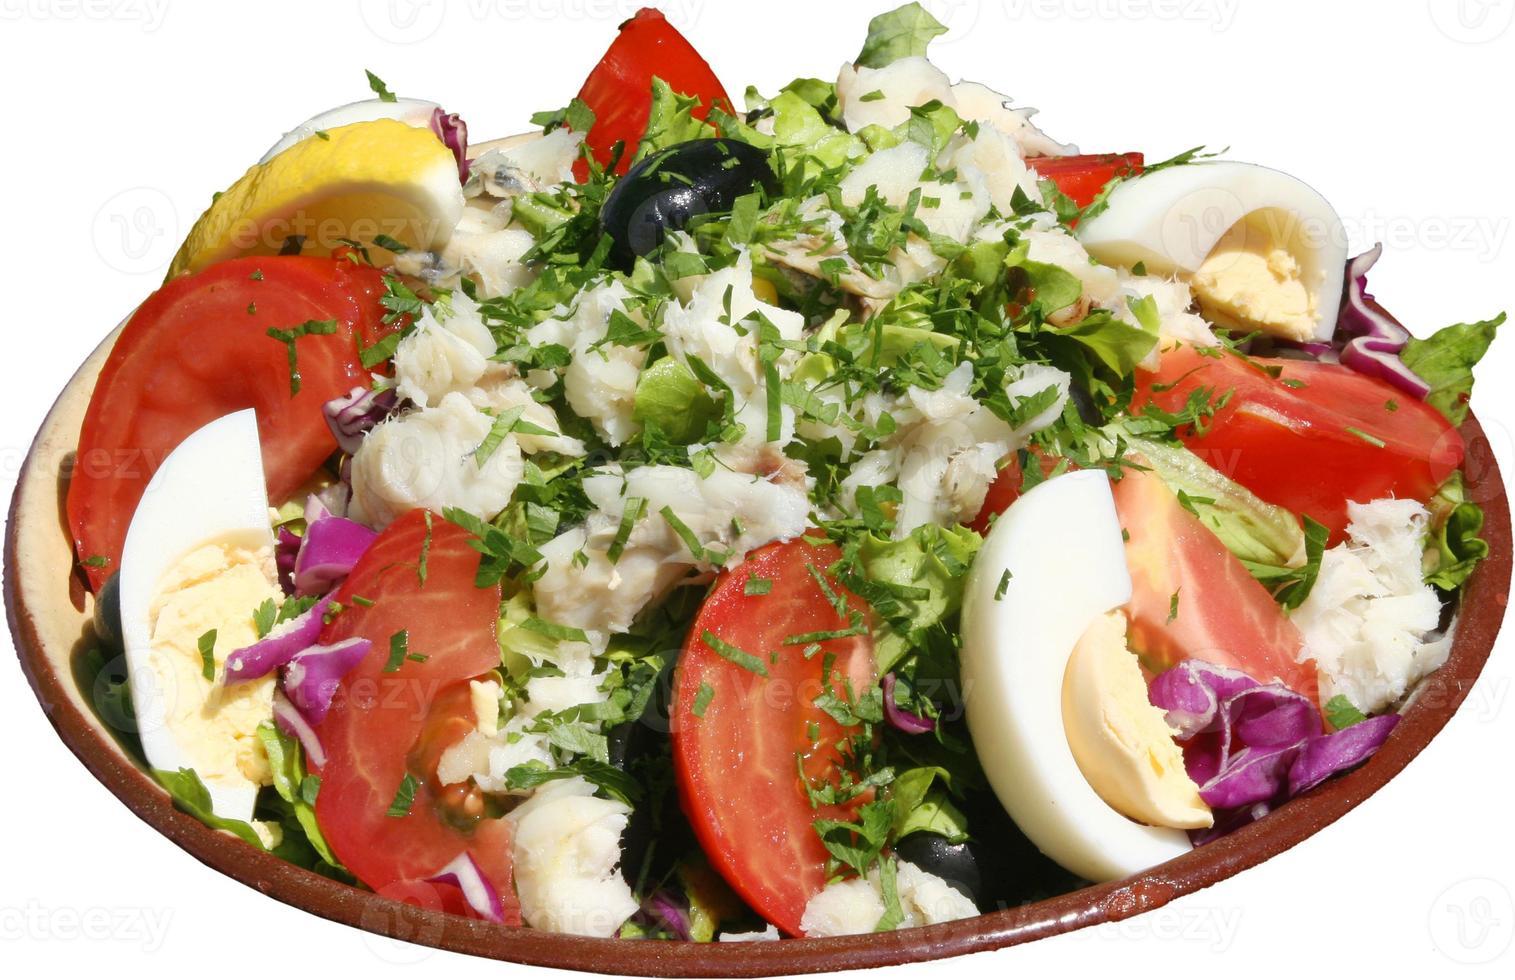 verse gekruide salade met groenten, eieren, tomaten en kruiden. foto